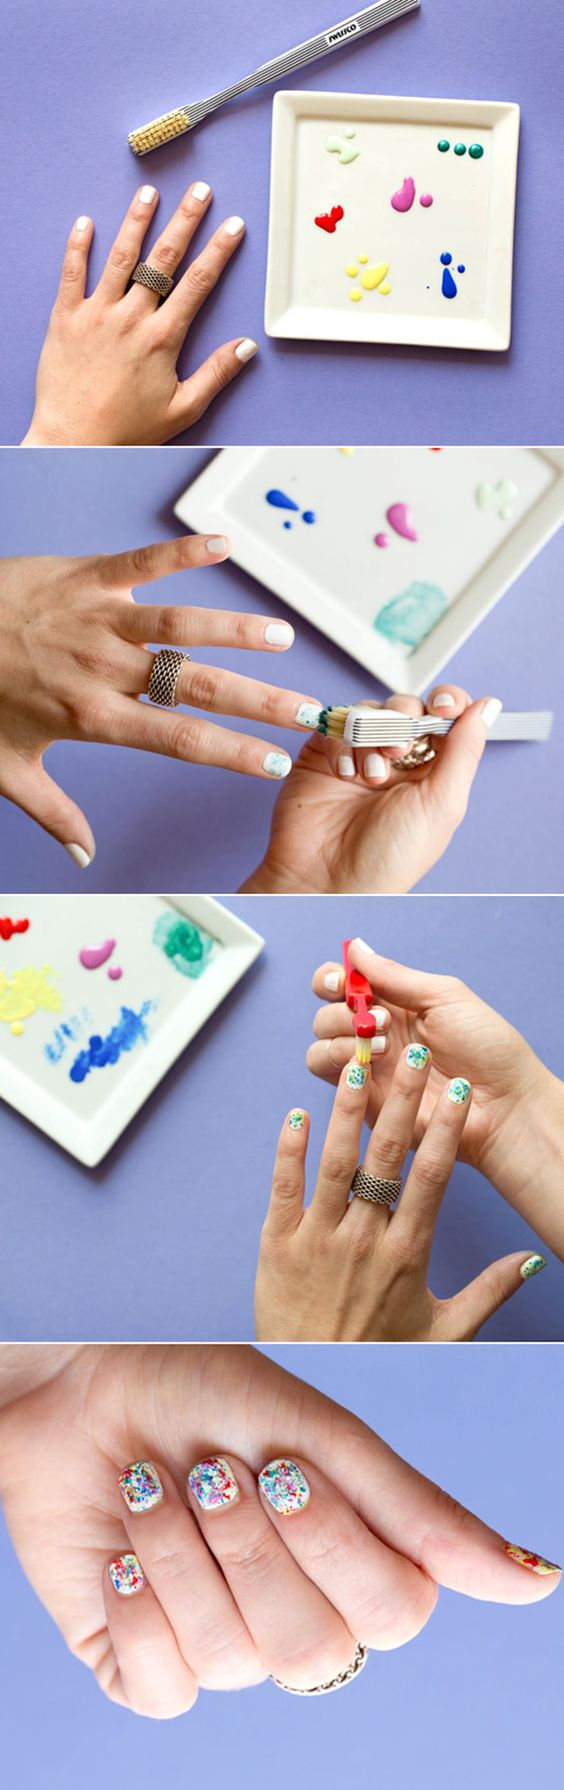 cepillo art nail